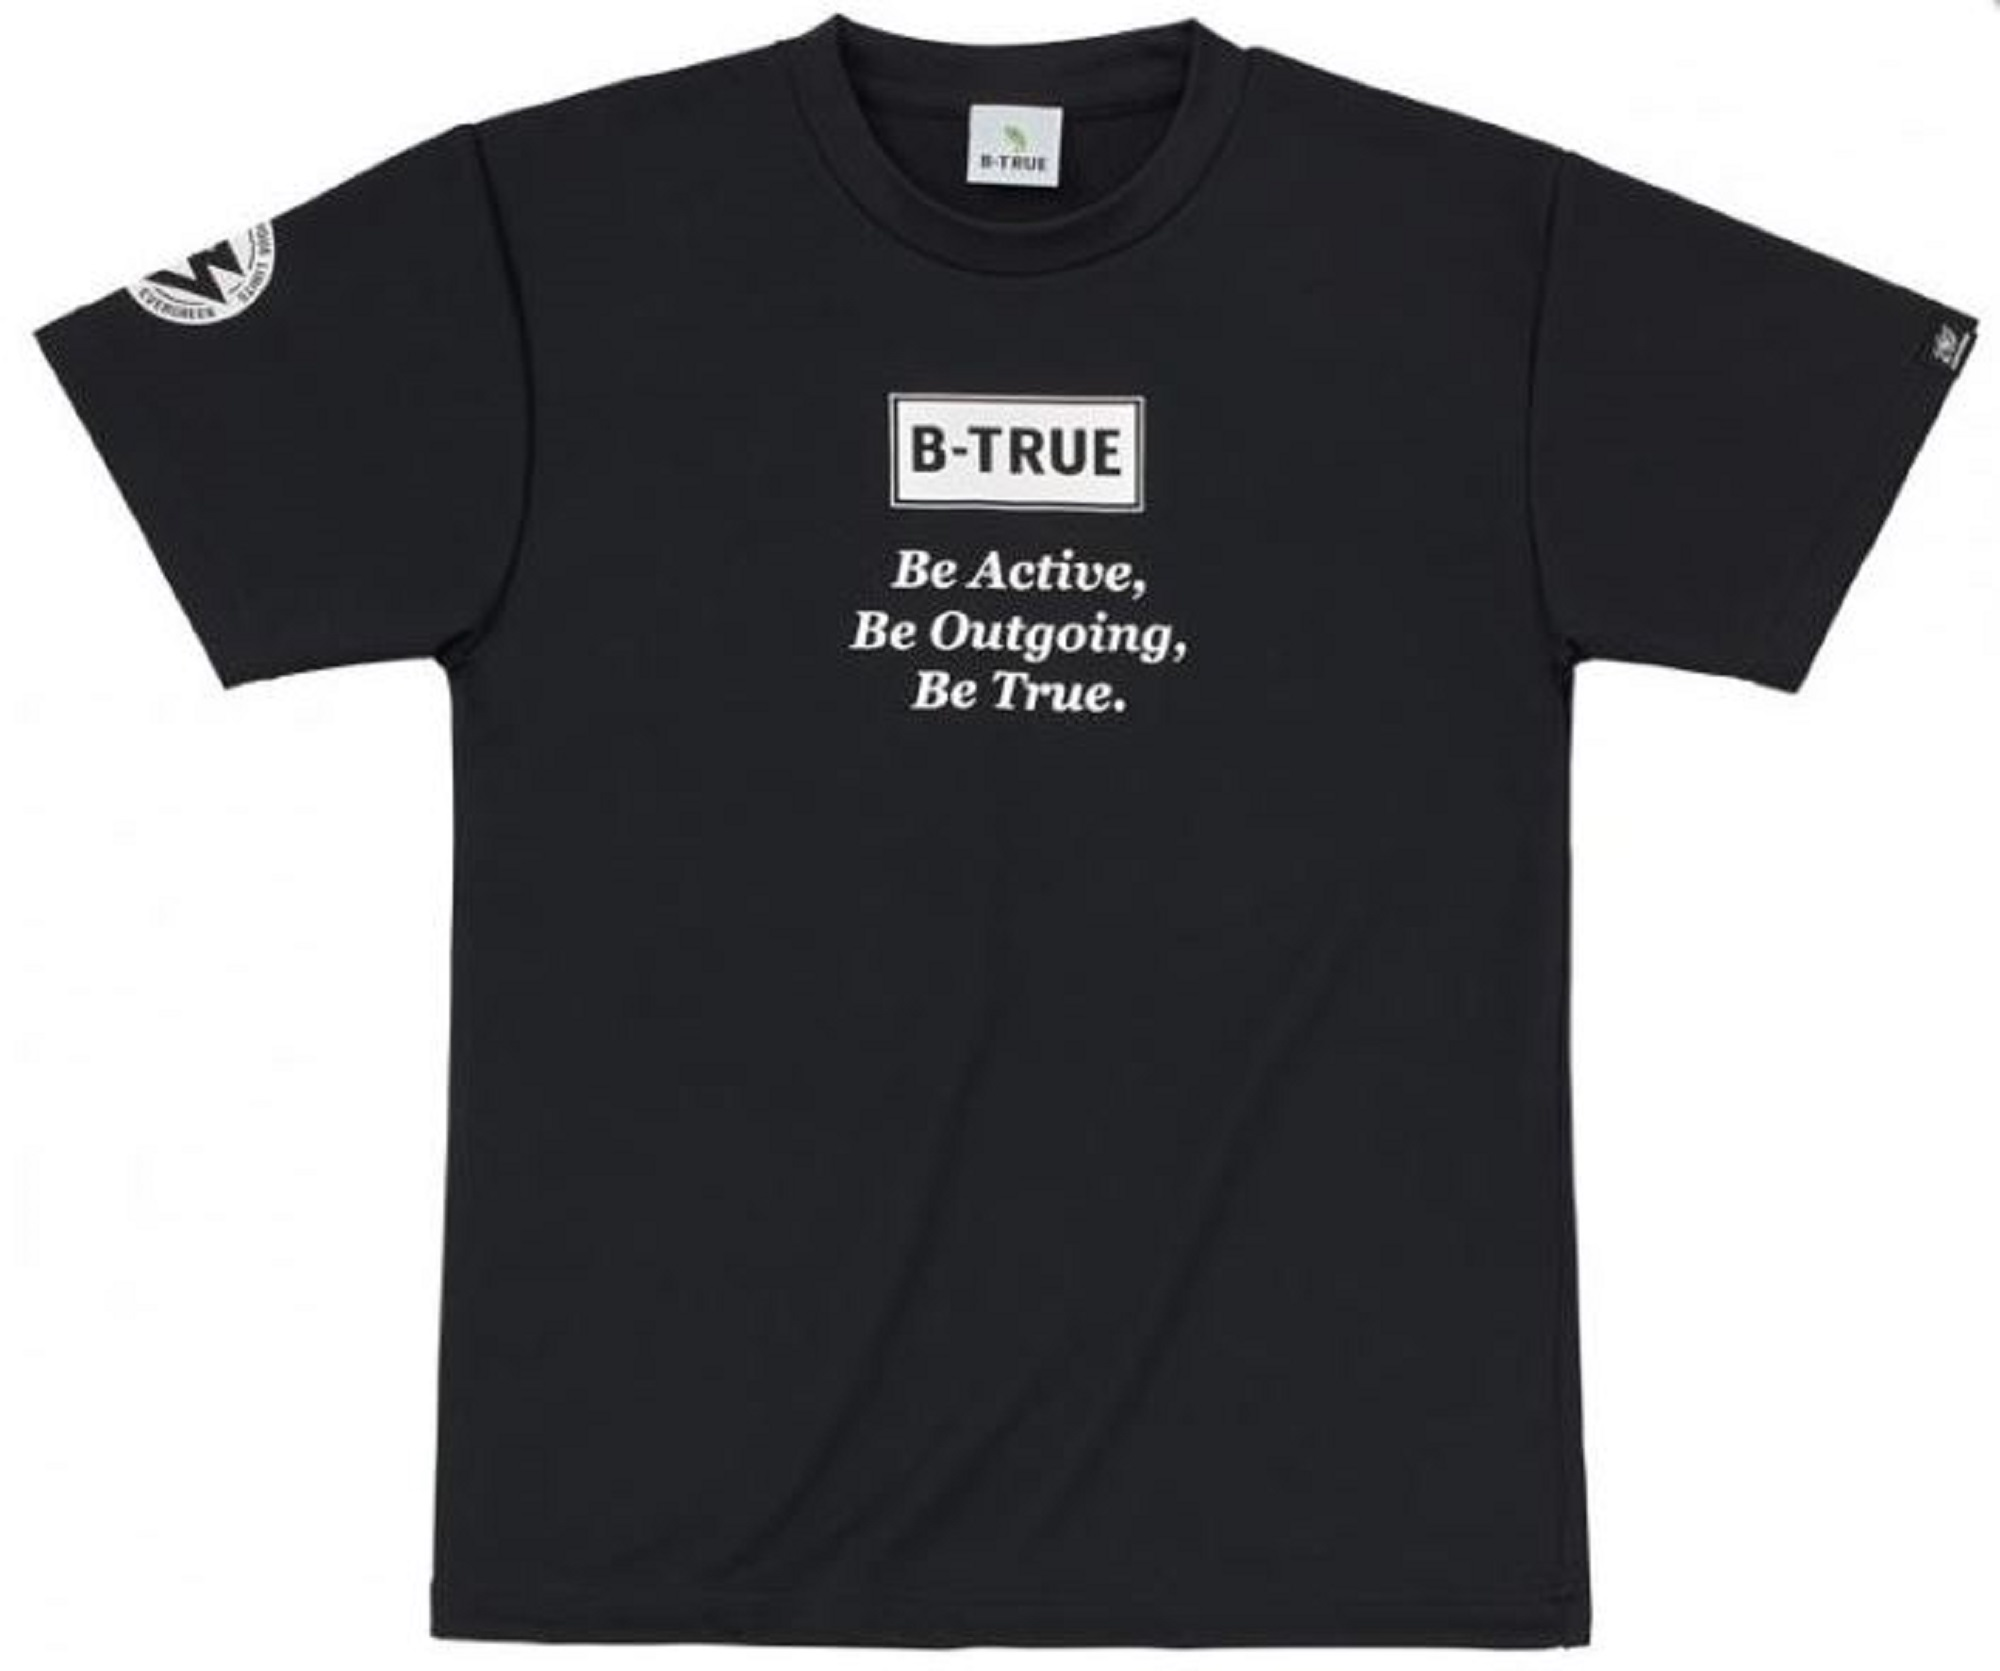 Evergreen T-Shirt Dry Fit Short Sleeve B-True D Type Size M Black (4814)